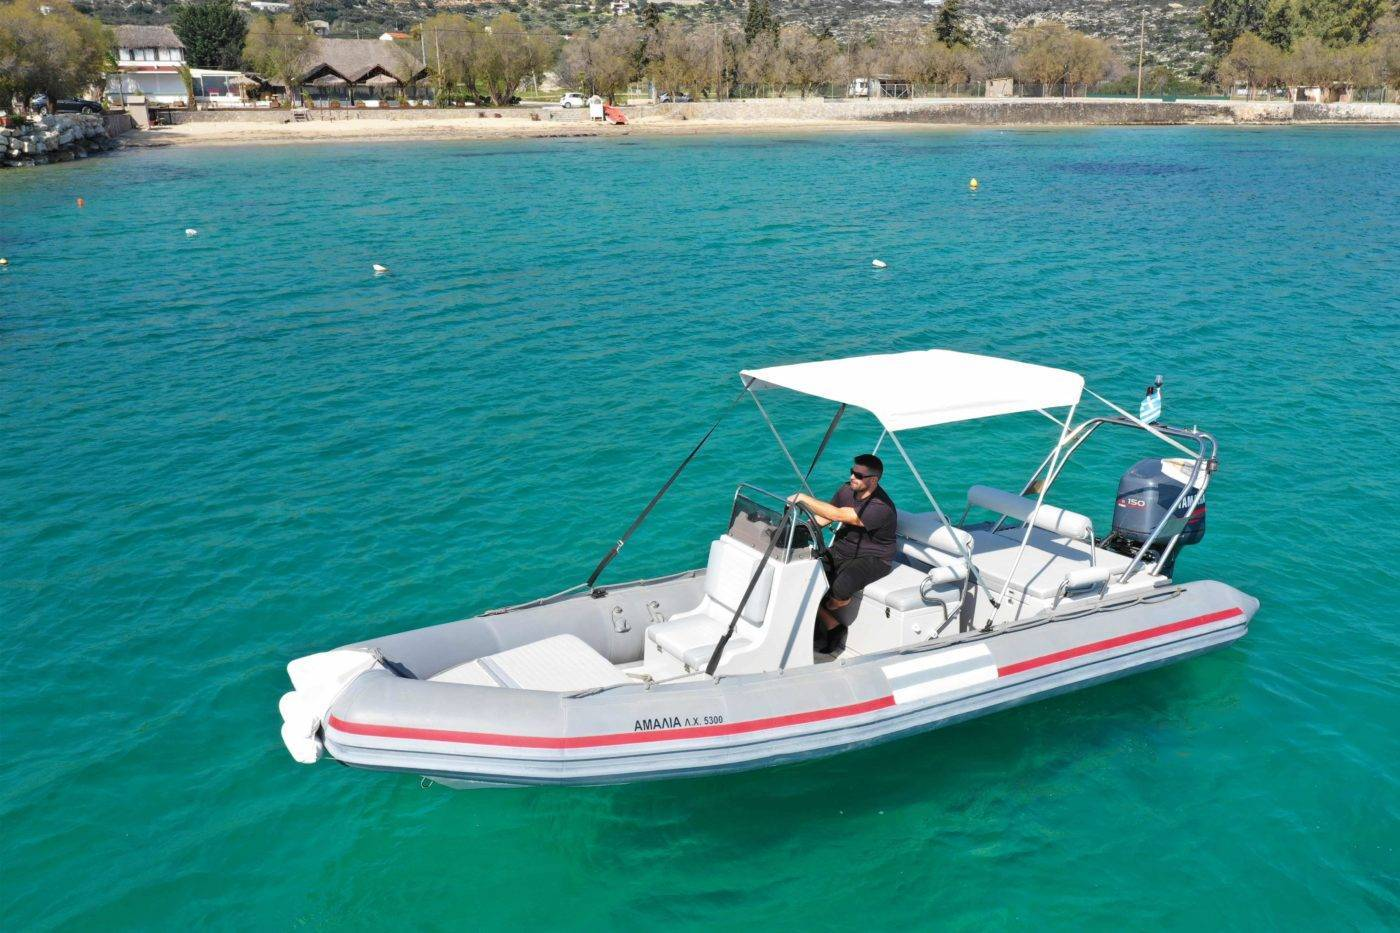 Rent a boat Chania_Notos_Mare_Rent_A_Boat_Chania_Marathi_Sfakia_150hp